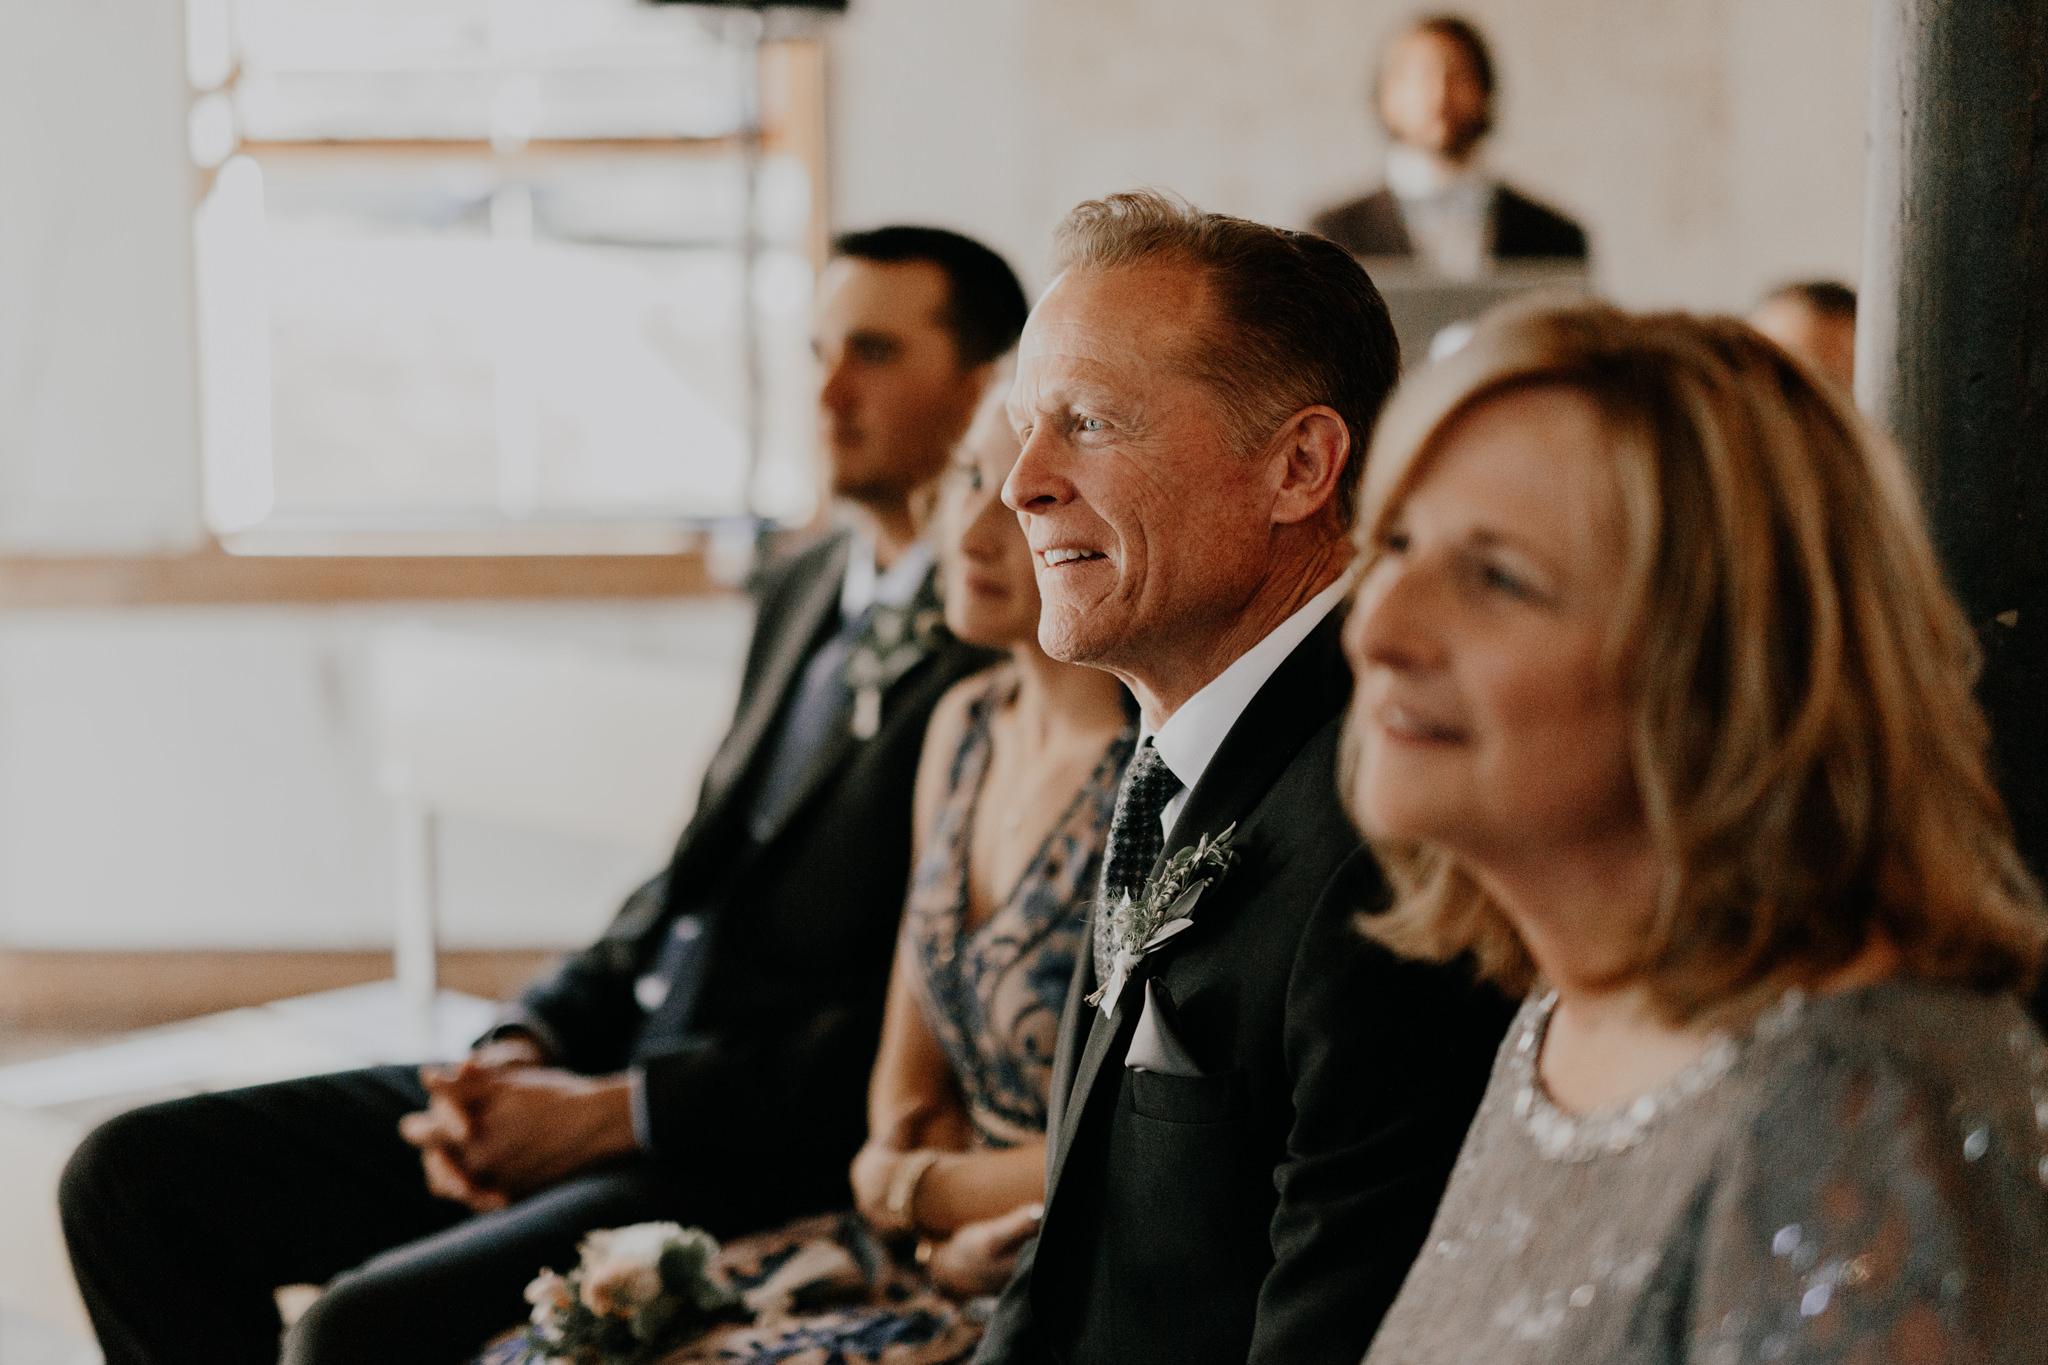 wedding-headlands-center-for-the-arts-sausalito-81.jpg